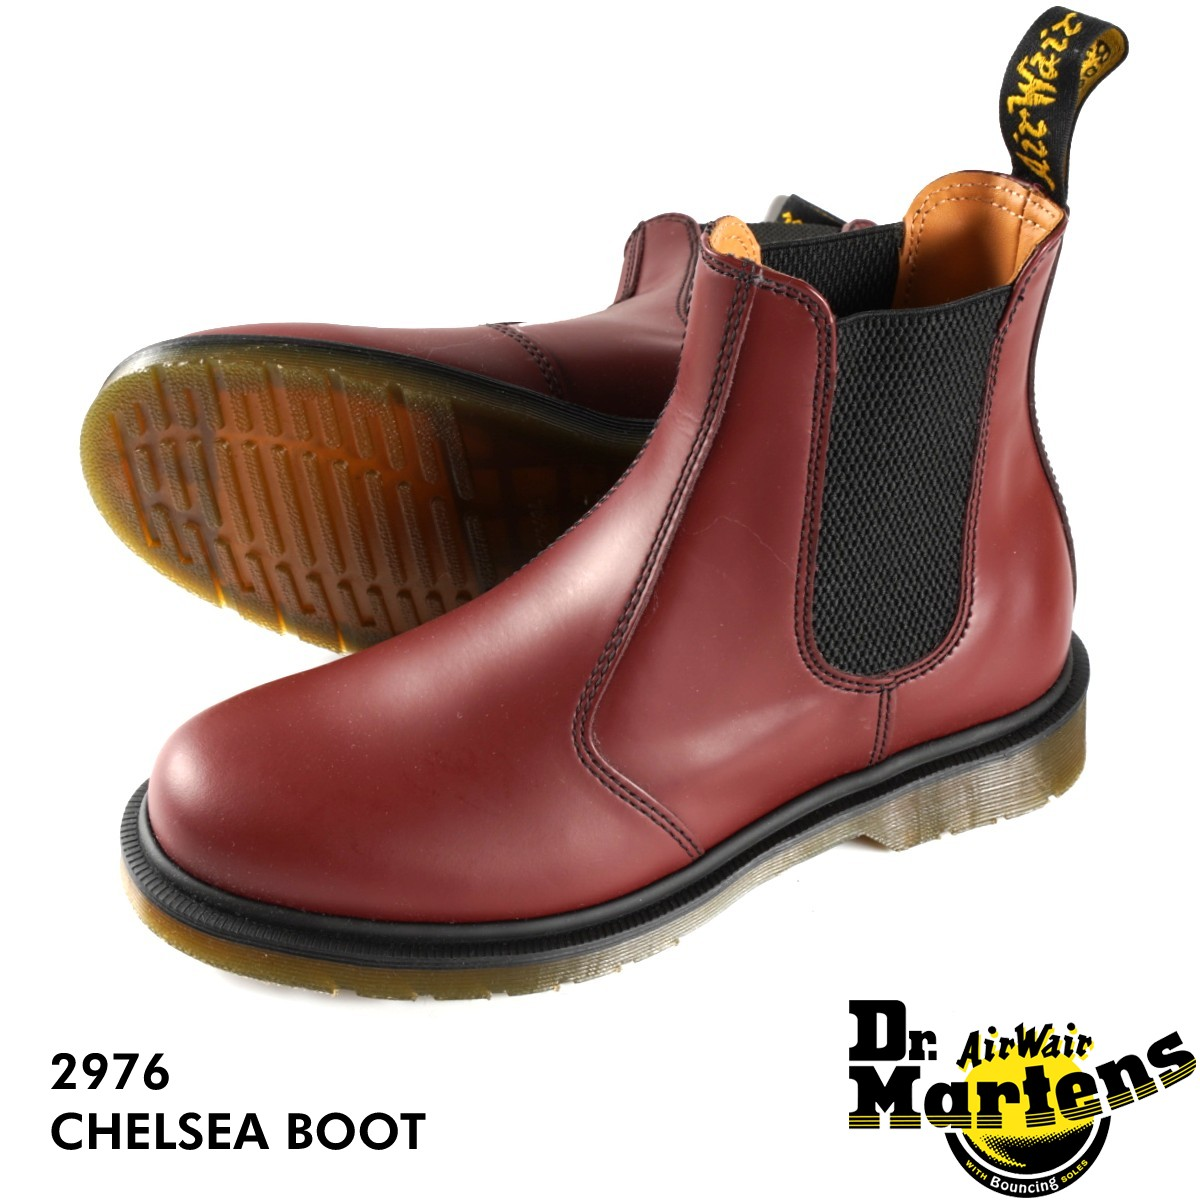 Dr.Martens CHELSEA BOOT 2976 【メンズ】【レディース】 ドクターマーチン チェルシー ブーツ CHERRY 赤 サイドゴア